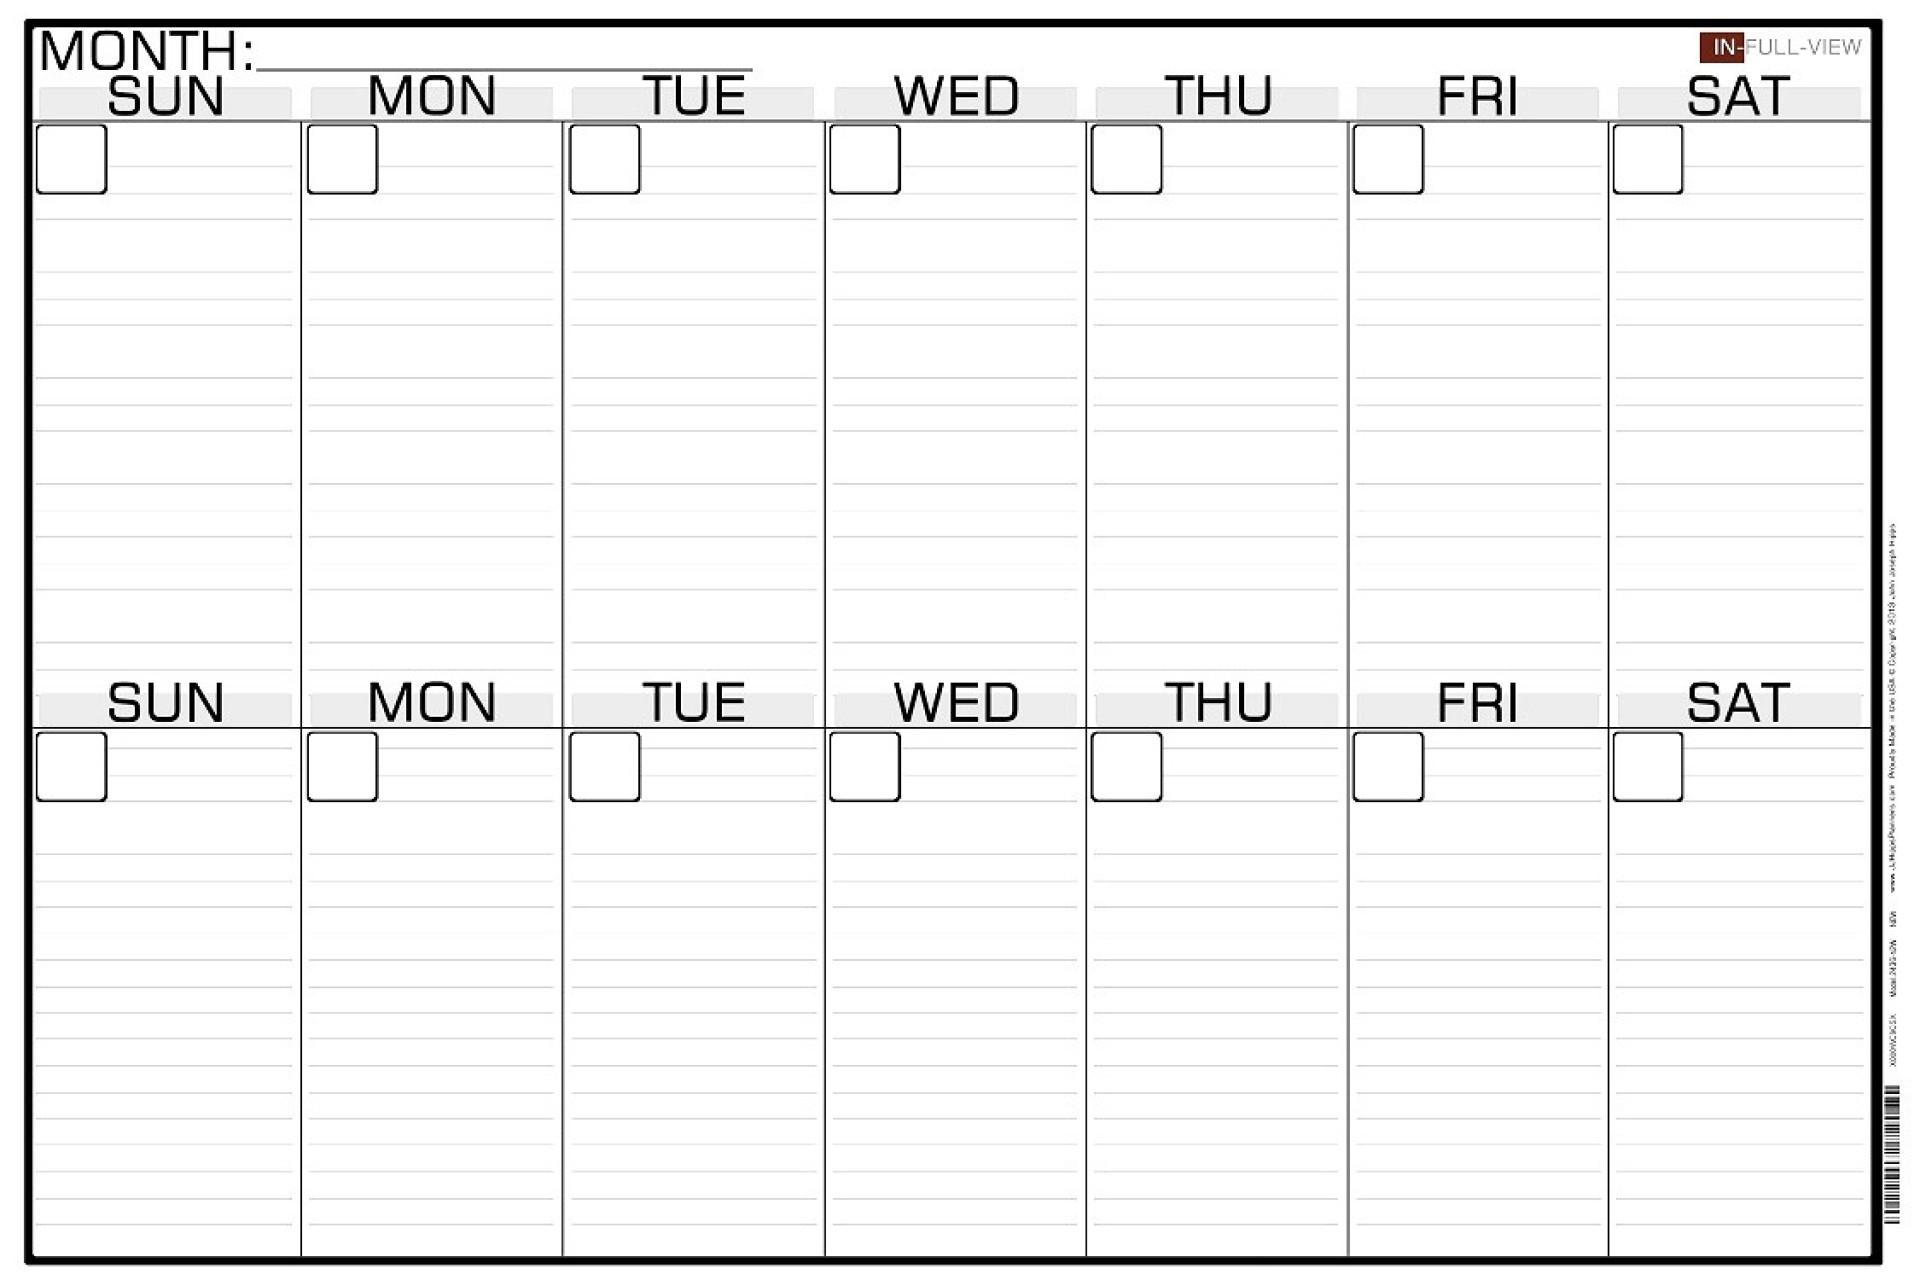 016 Weekly Calendar Template Madinbelgrade Free Printable